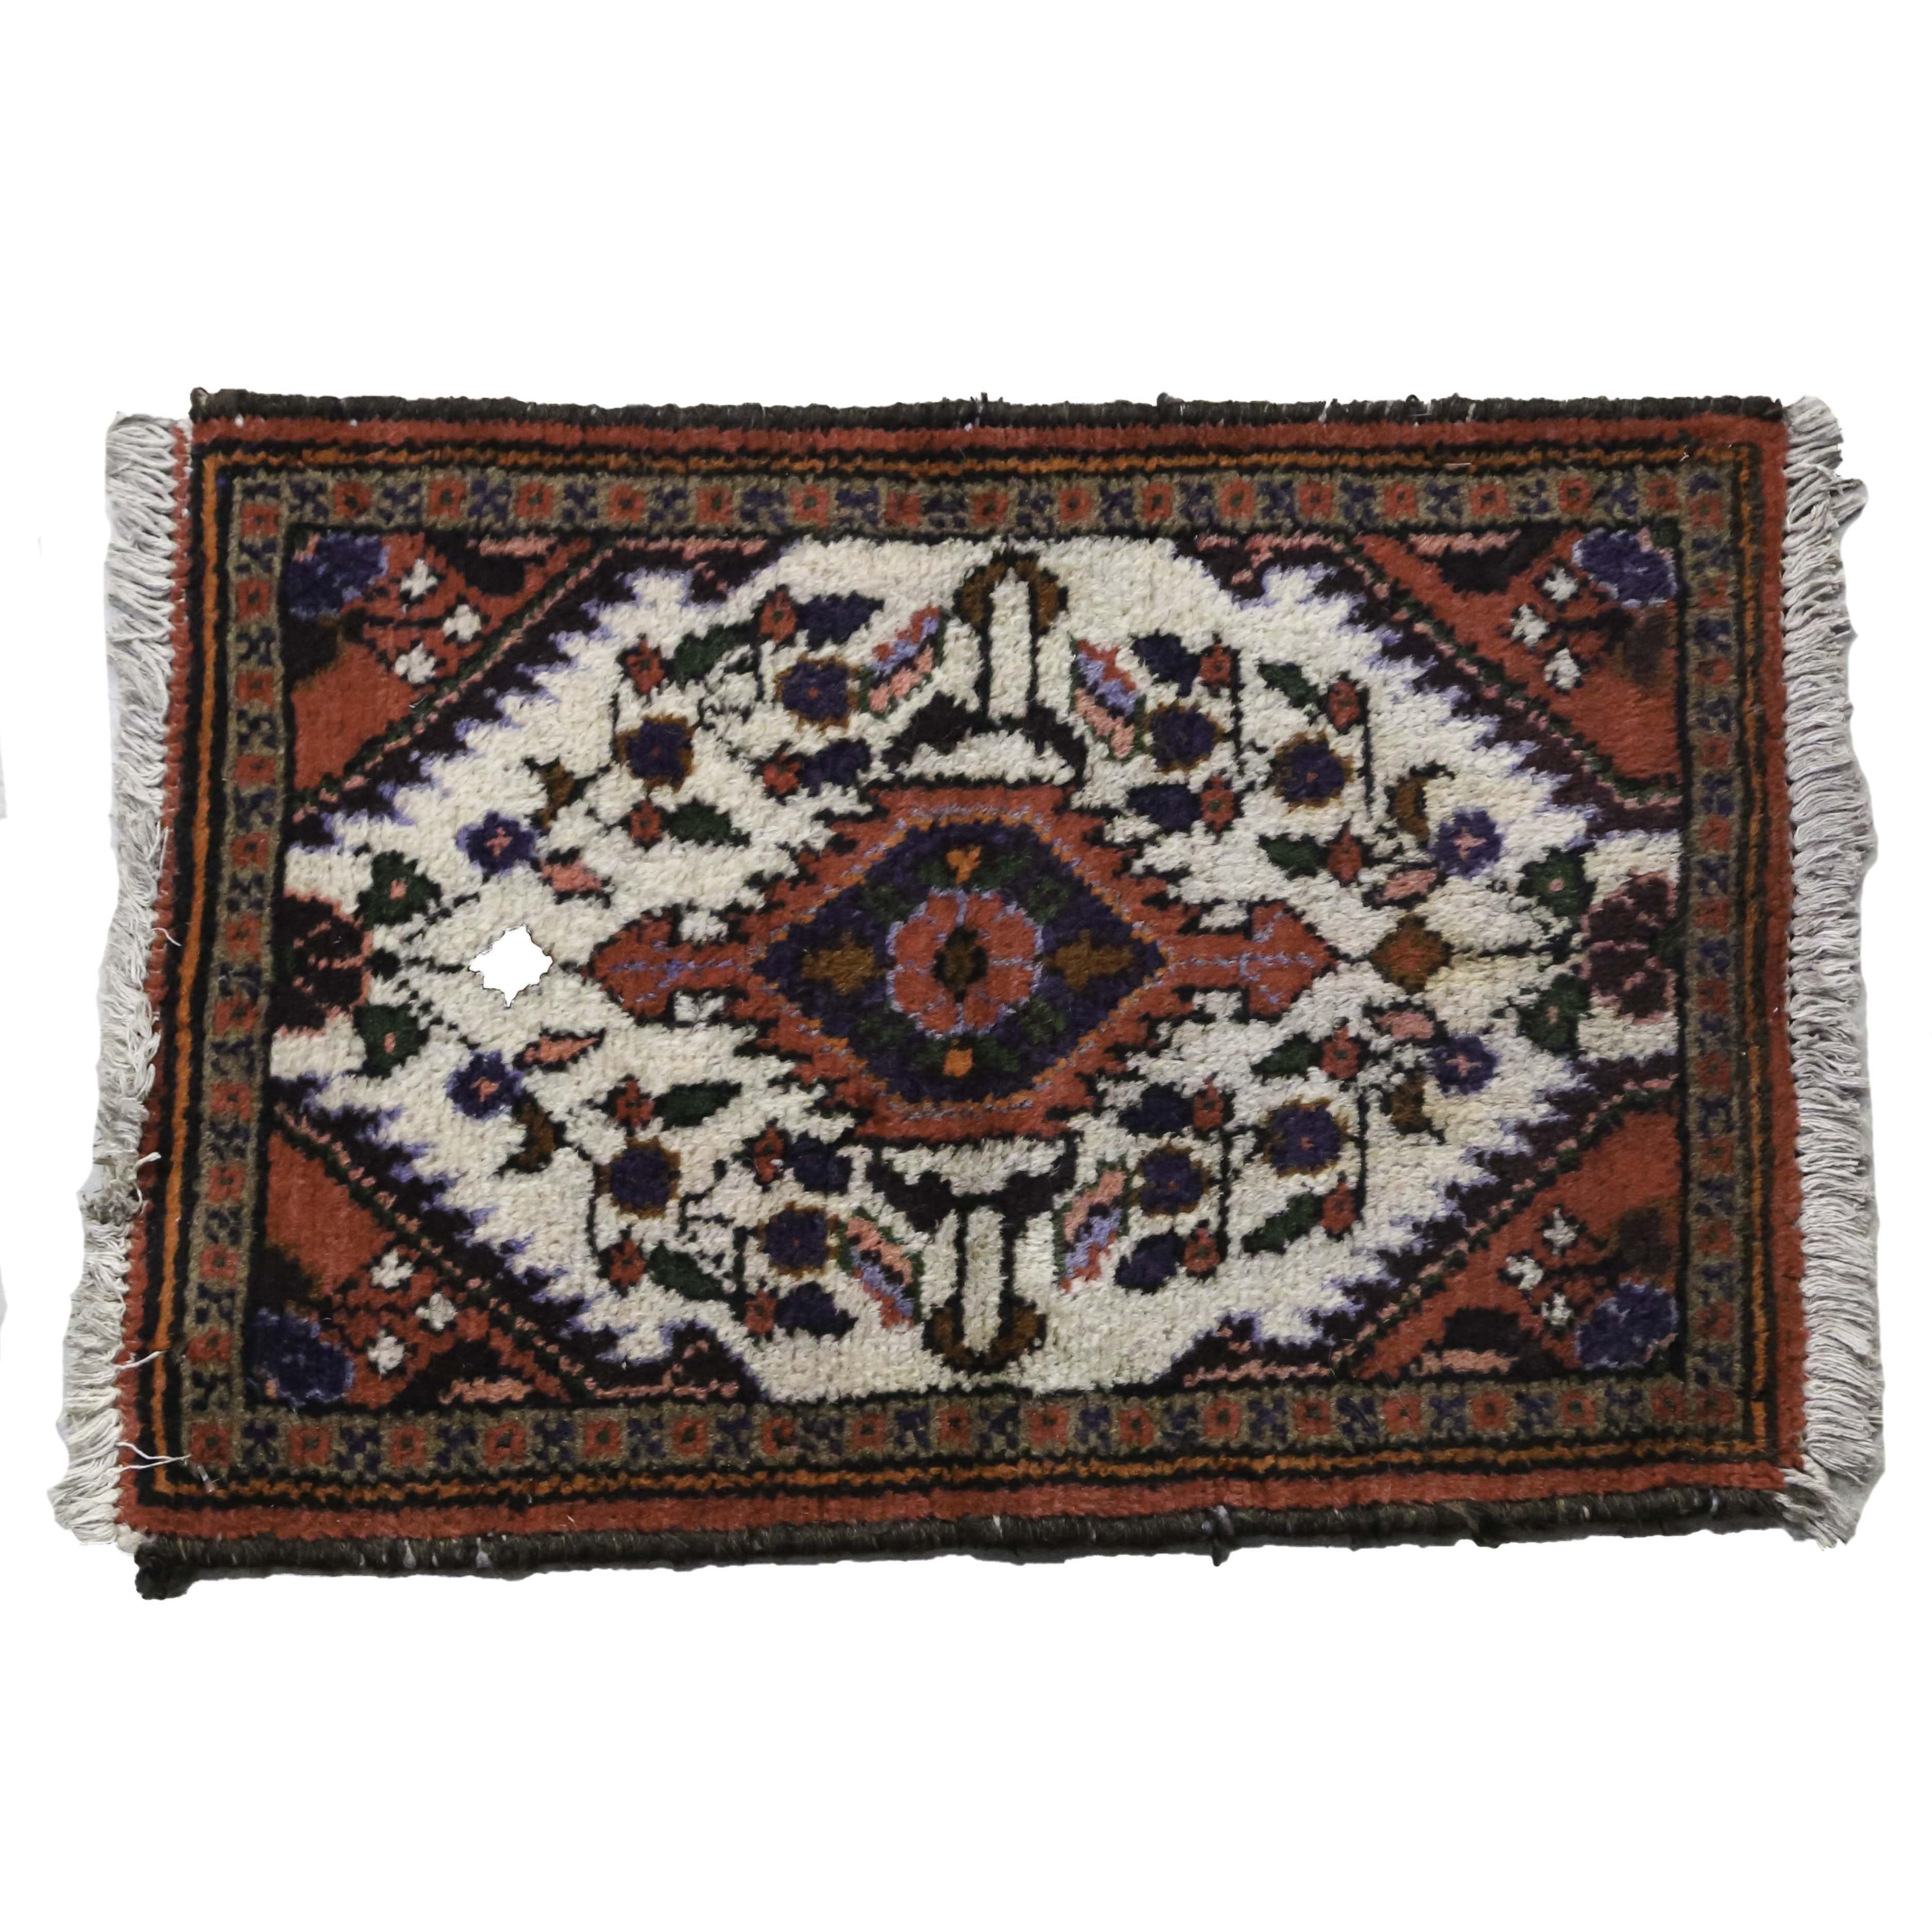 Hand-Knotted Wool Persian Hamadan Area Rug